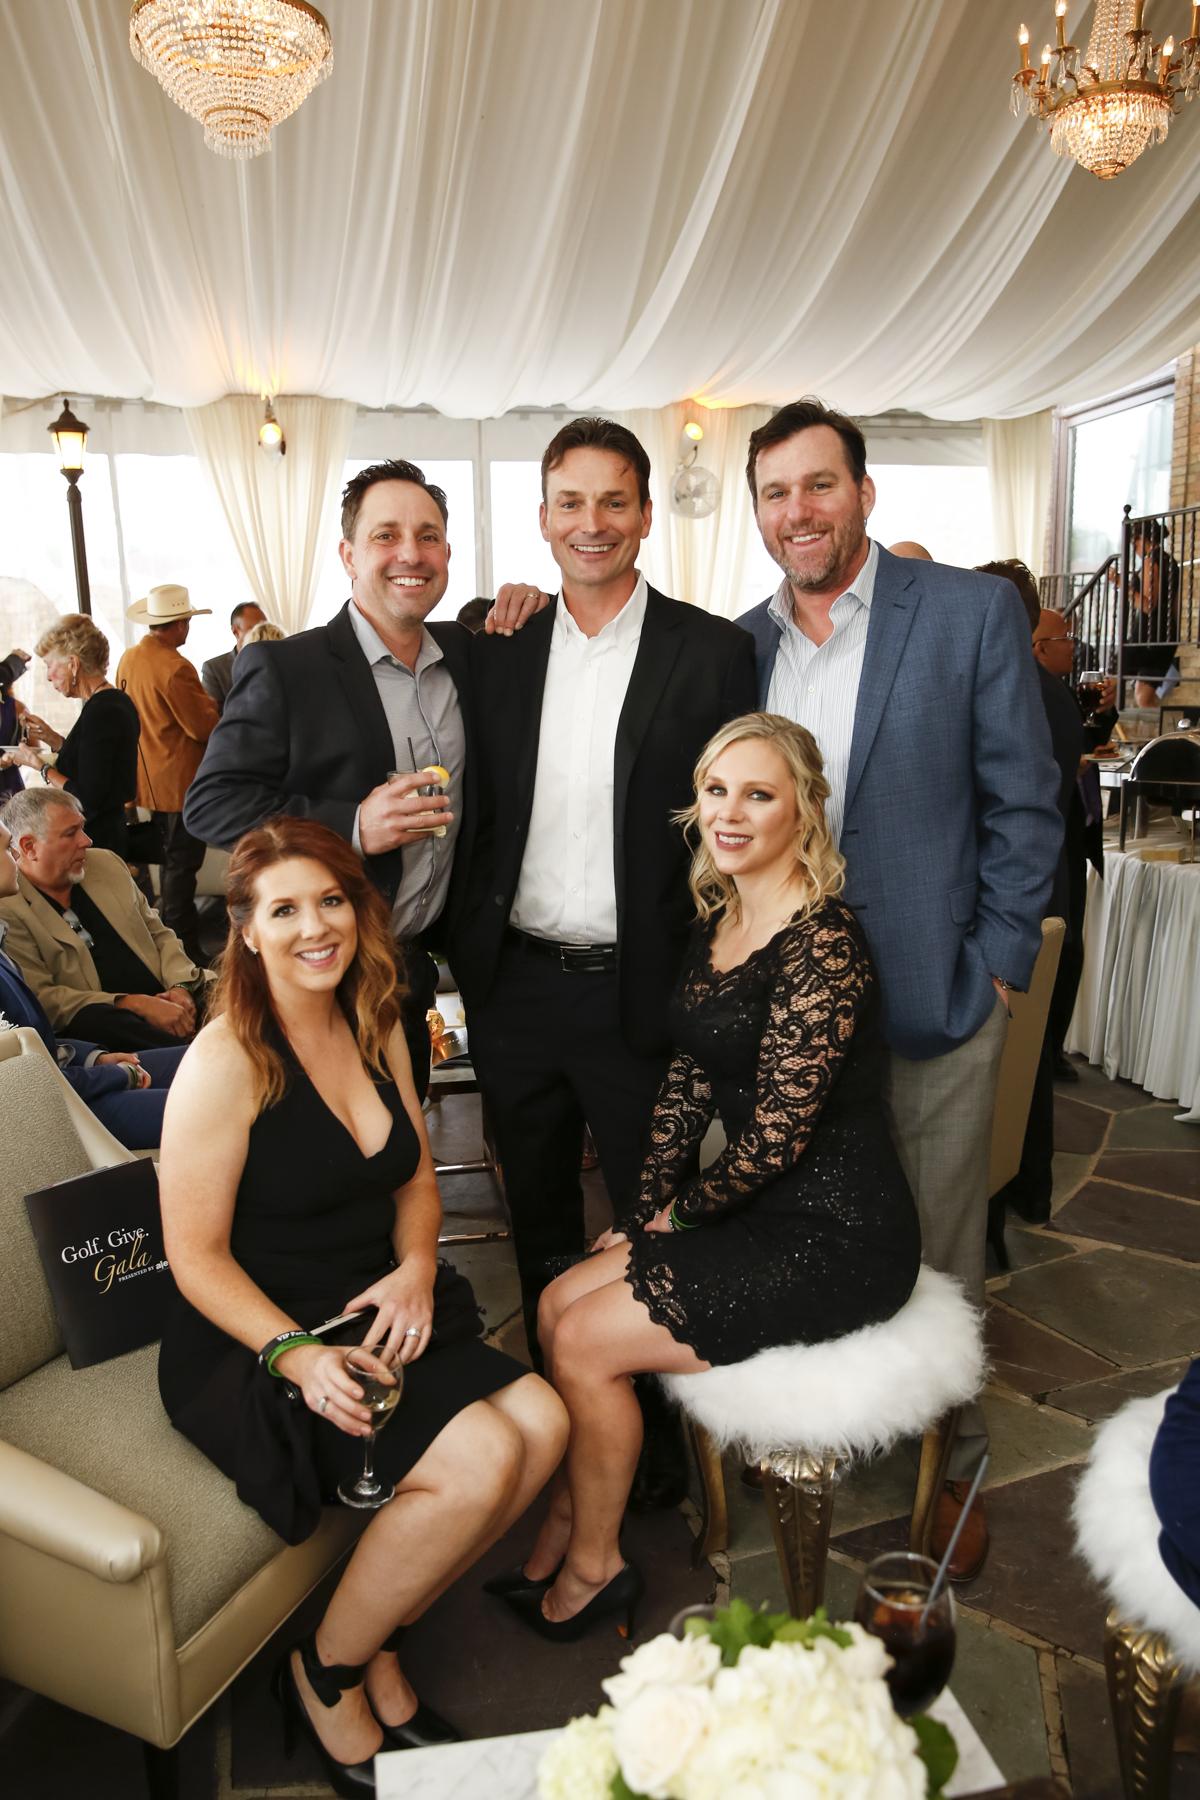 golf-give-gala-celebrity-michael-phelps-jason-day-event-photographer-madison-wi-31.jpg